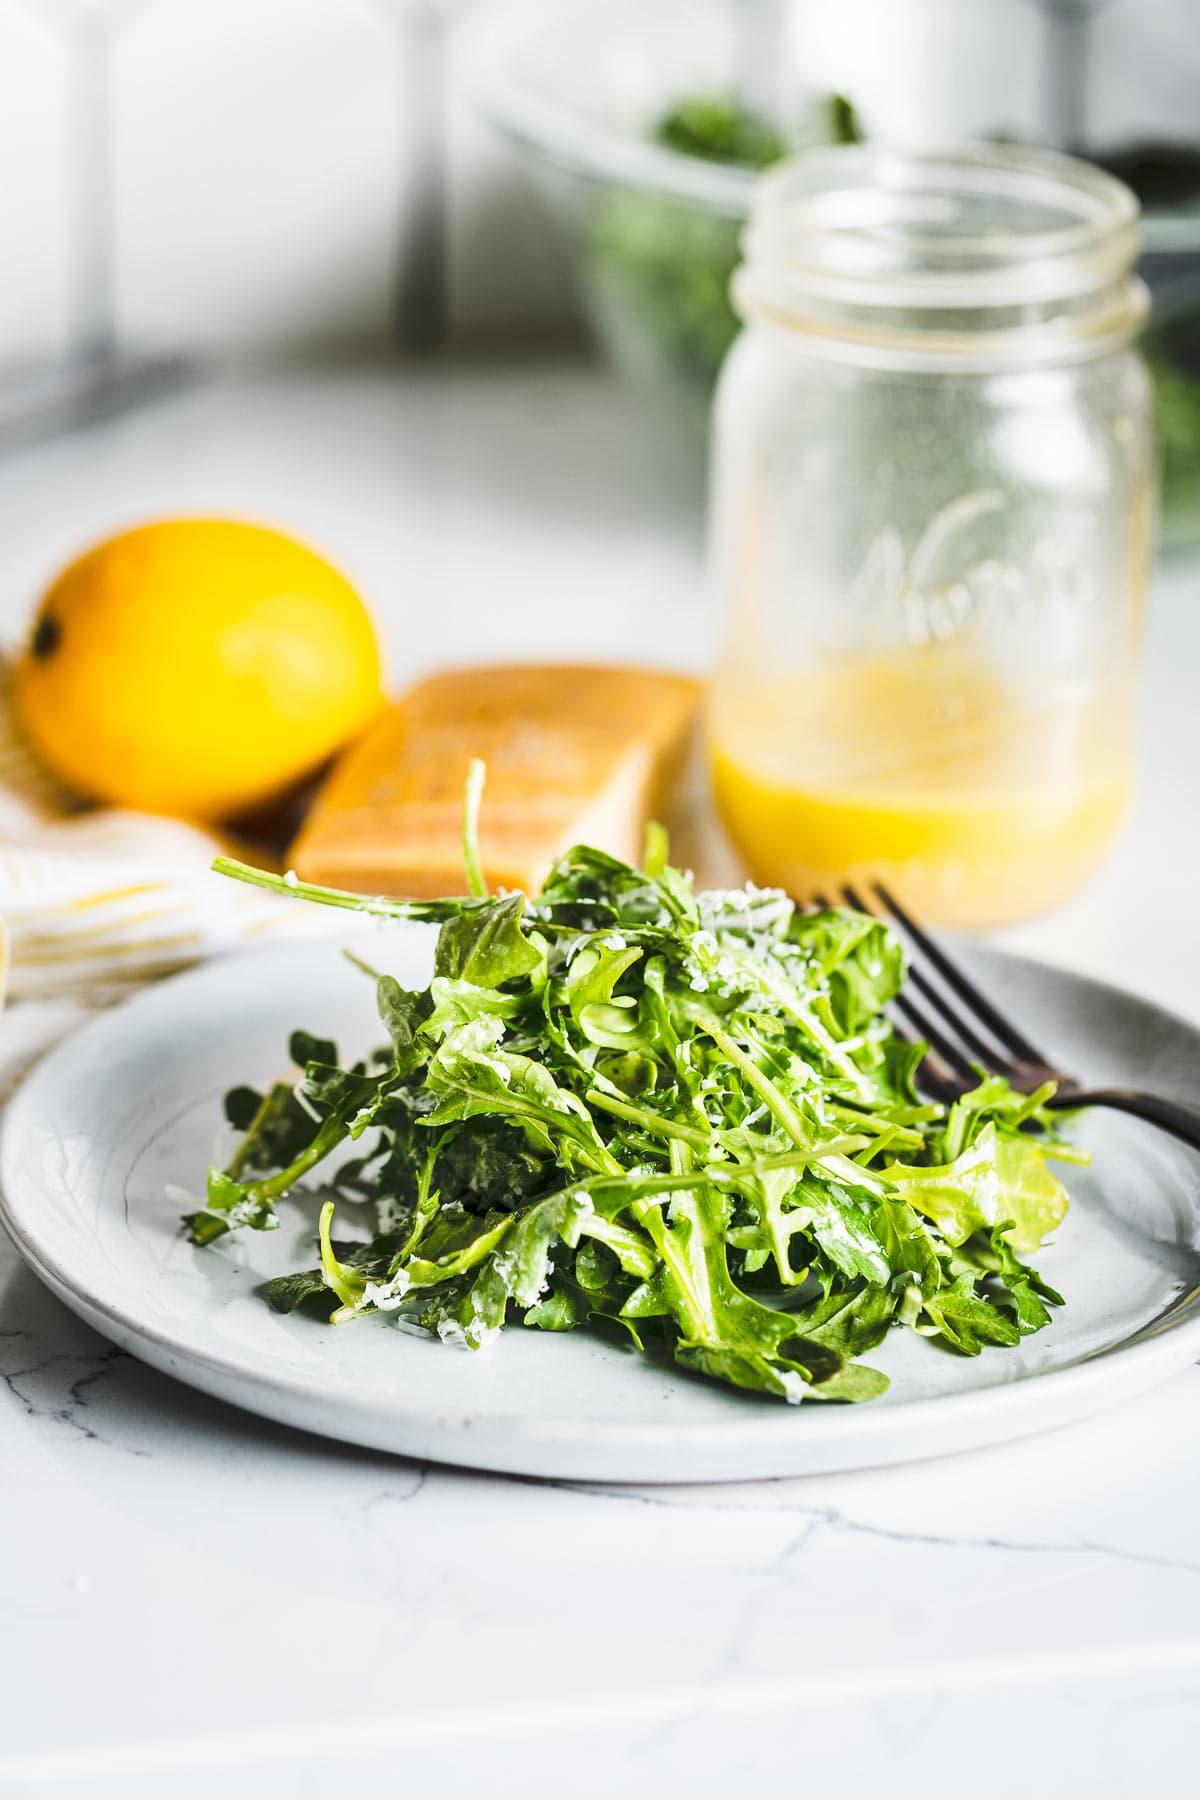 arugula salad with lemon vinaigrette on plate vertical